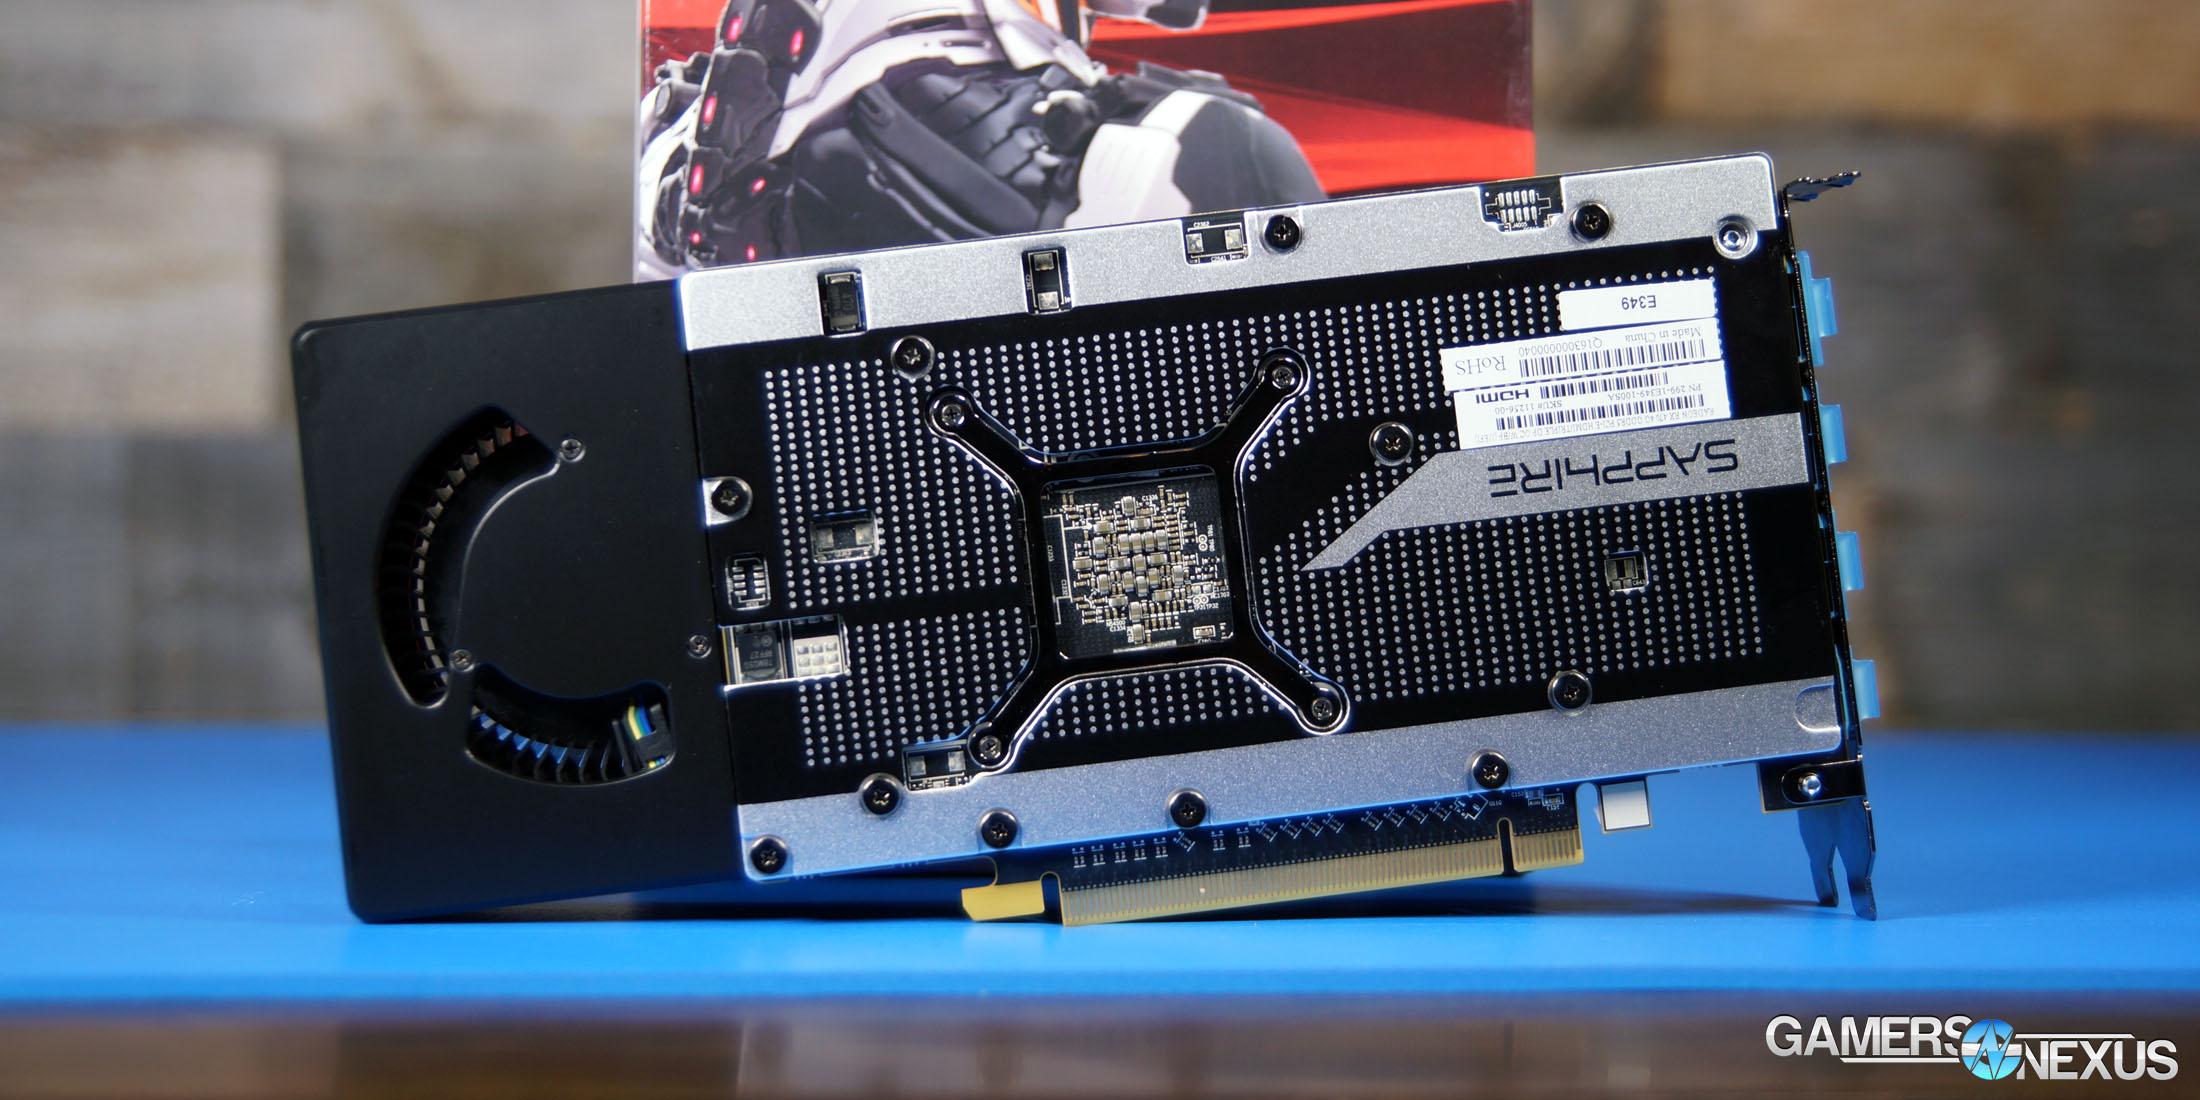 Sapphire RX 470 Platinum Review & Benchmark vs  GTX 1060, RX 480 4GB